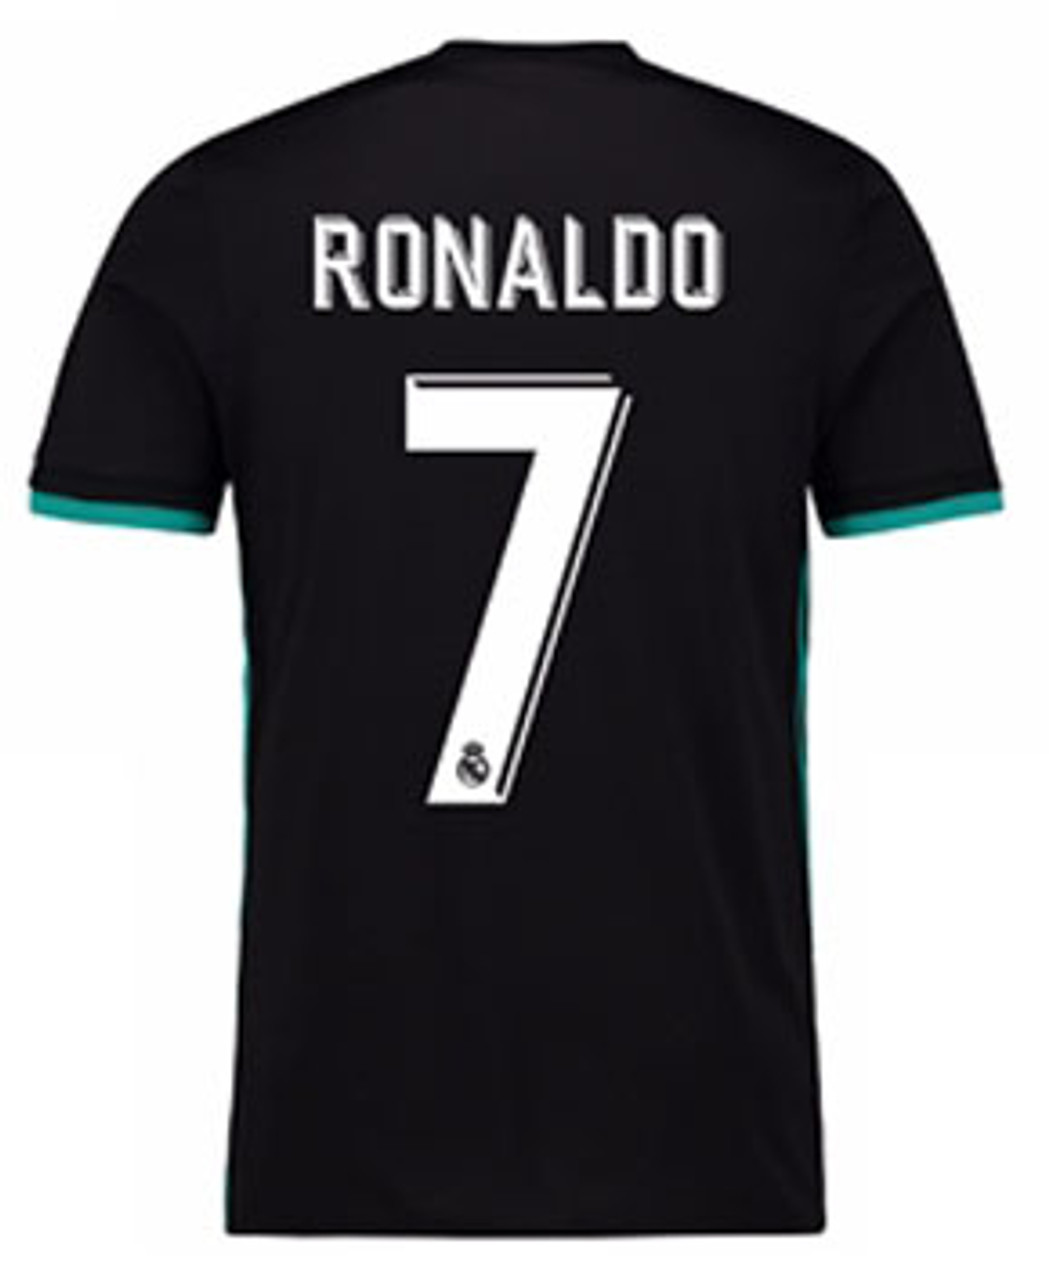 5d8d2d764 ADIDAS REAL MADRID 2018 AWAY RONALDO BLACK JERSEY - Soccer Plus